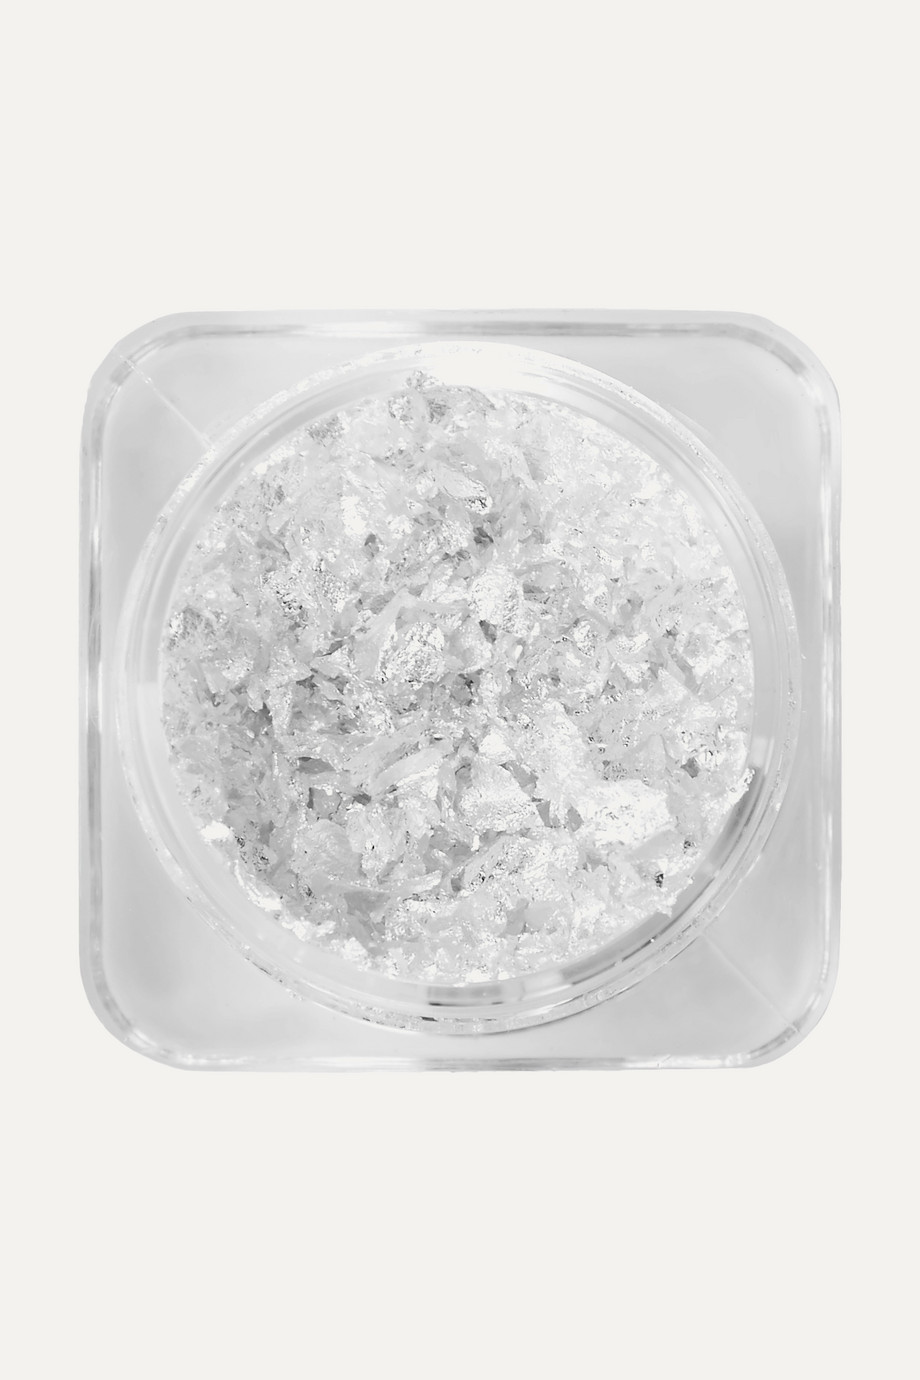 Mimi Luzon Wonder Dust - Pure Silver